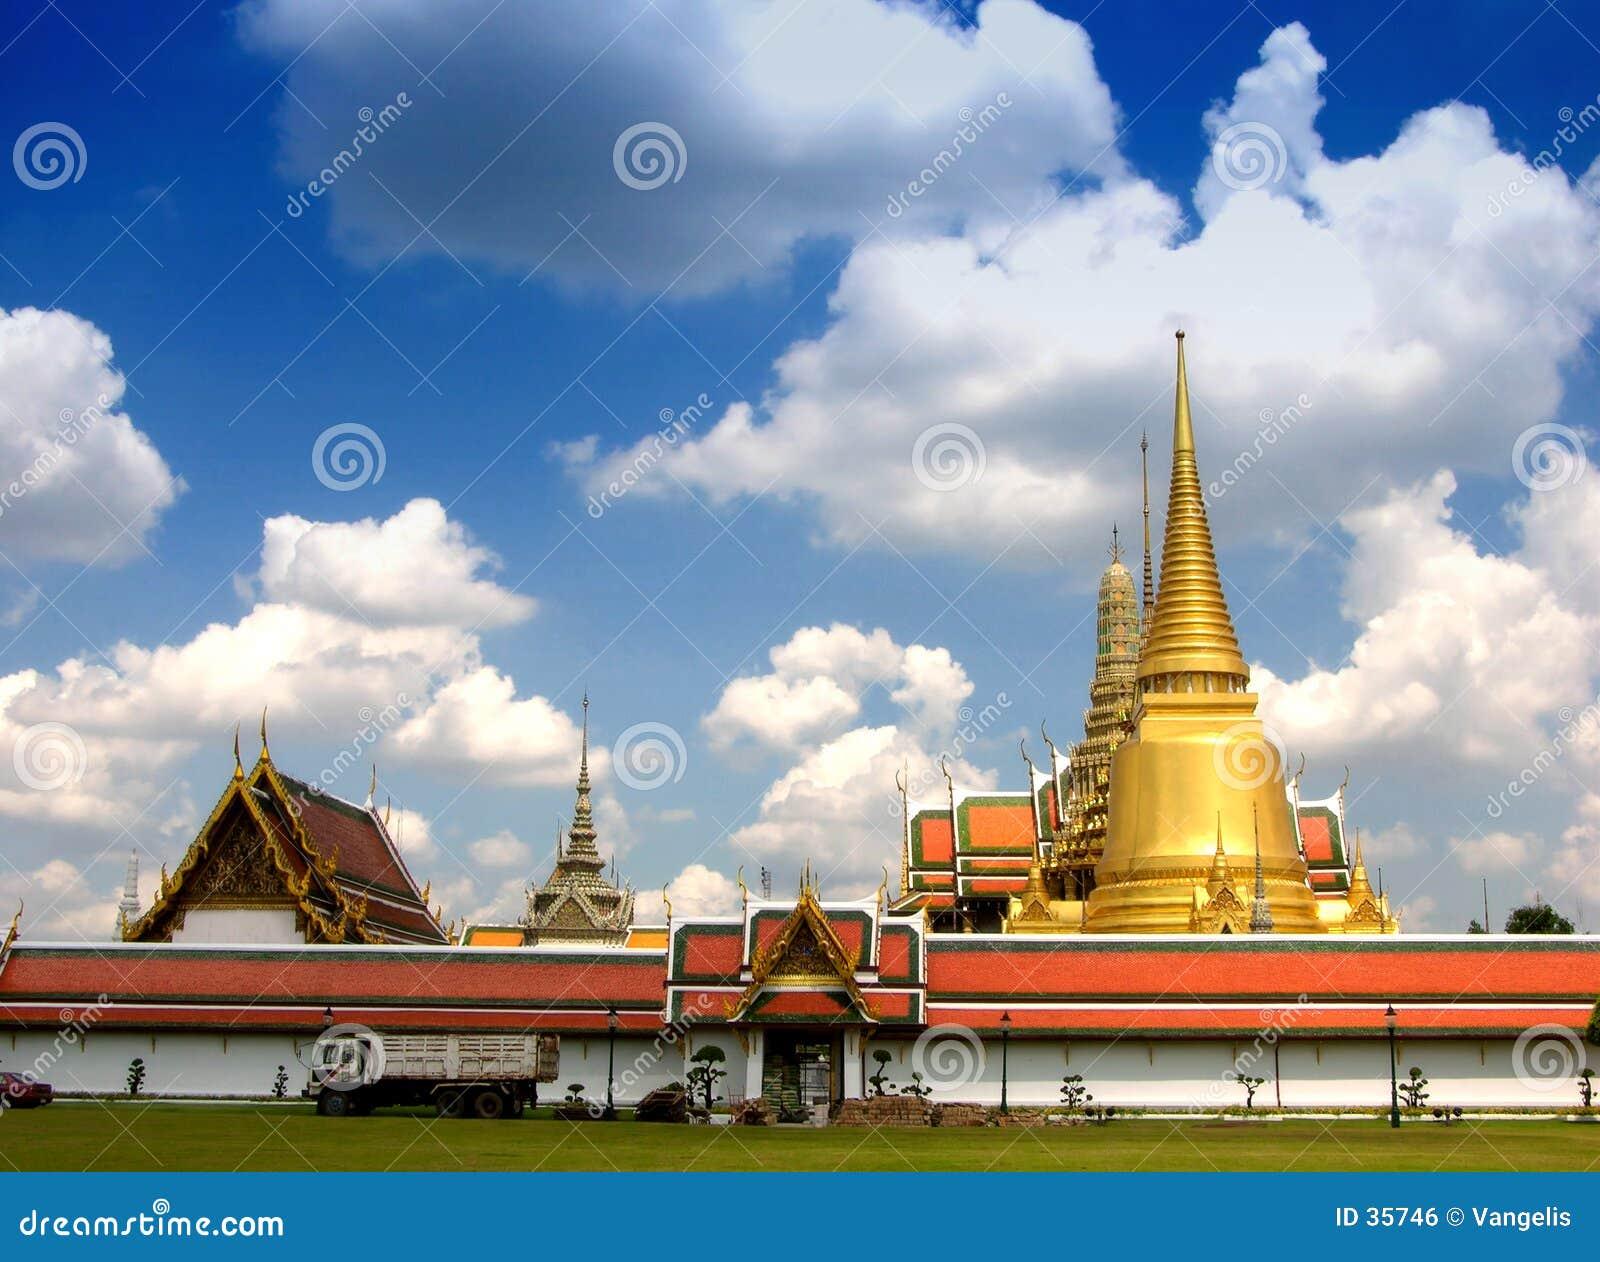 Palácio grande fabuloso e Wat Phra Kaeo - Banguecoque, Tailândia 3